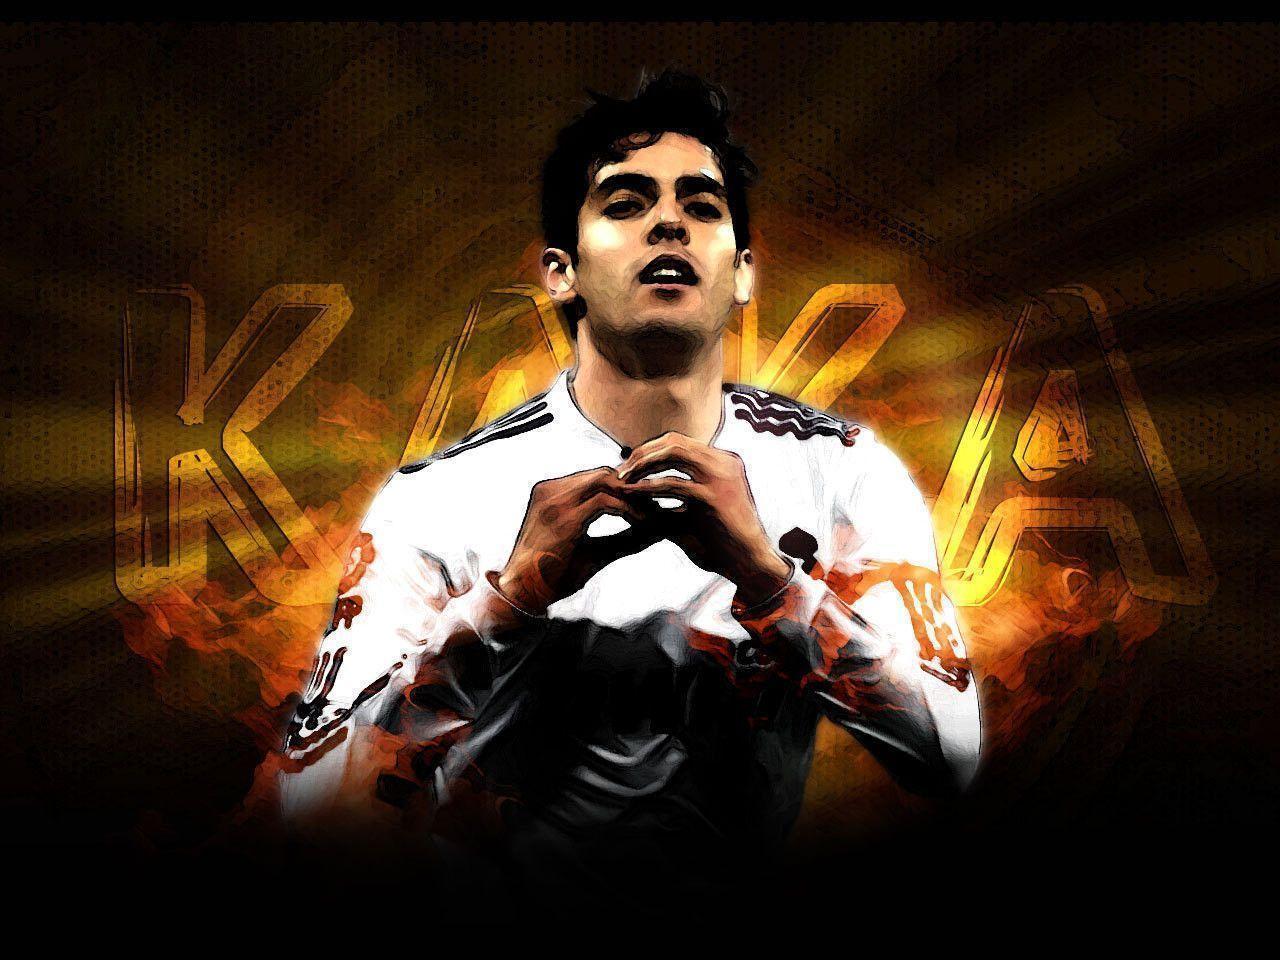 Kaka Wallpaper Real Madrid